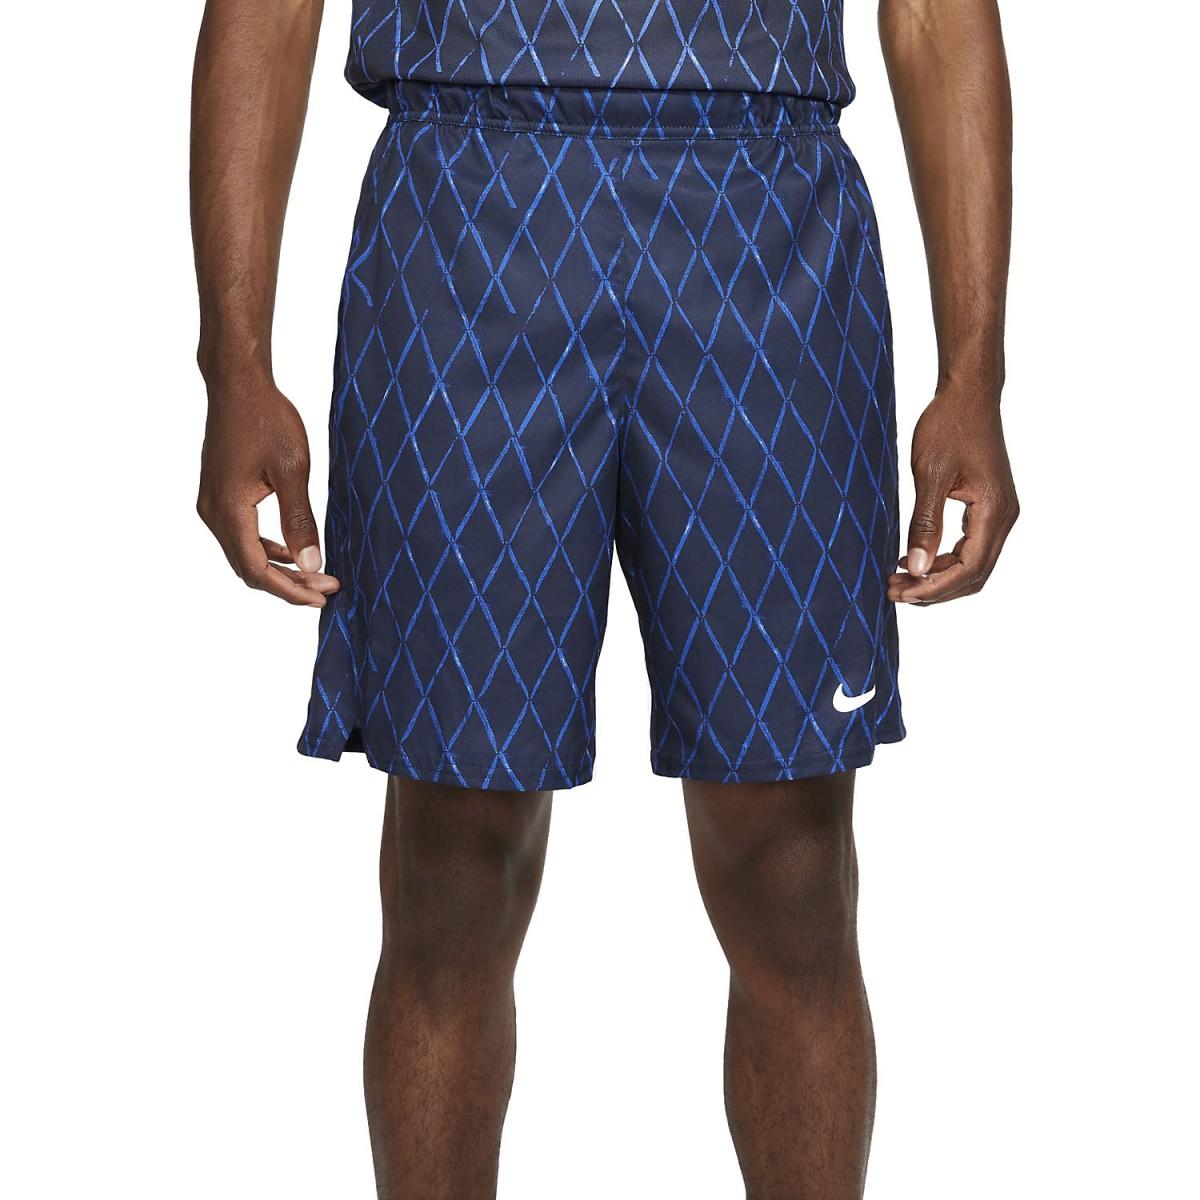 Теннисные шорты мужские Nike Court Victory Short 9in Printed obsidian/white